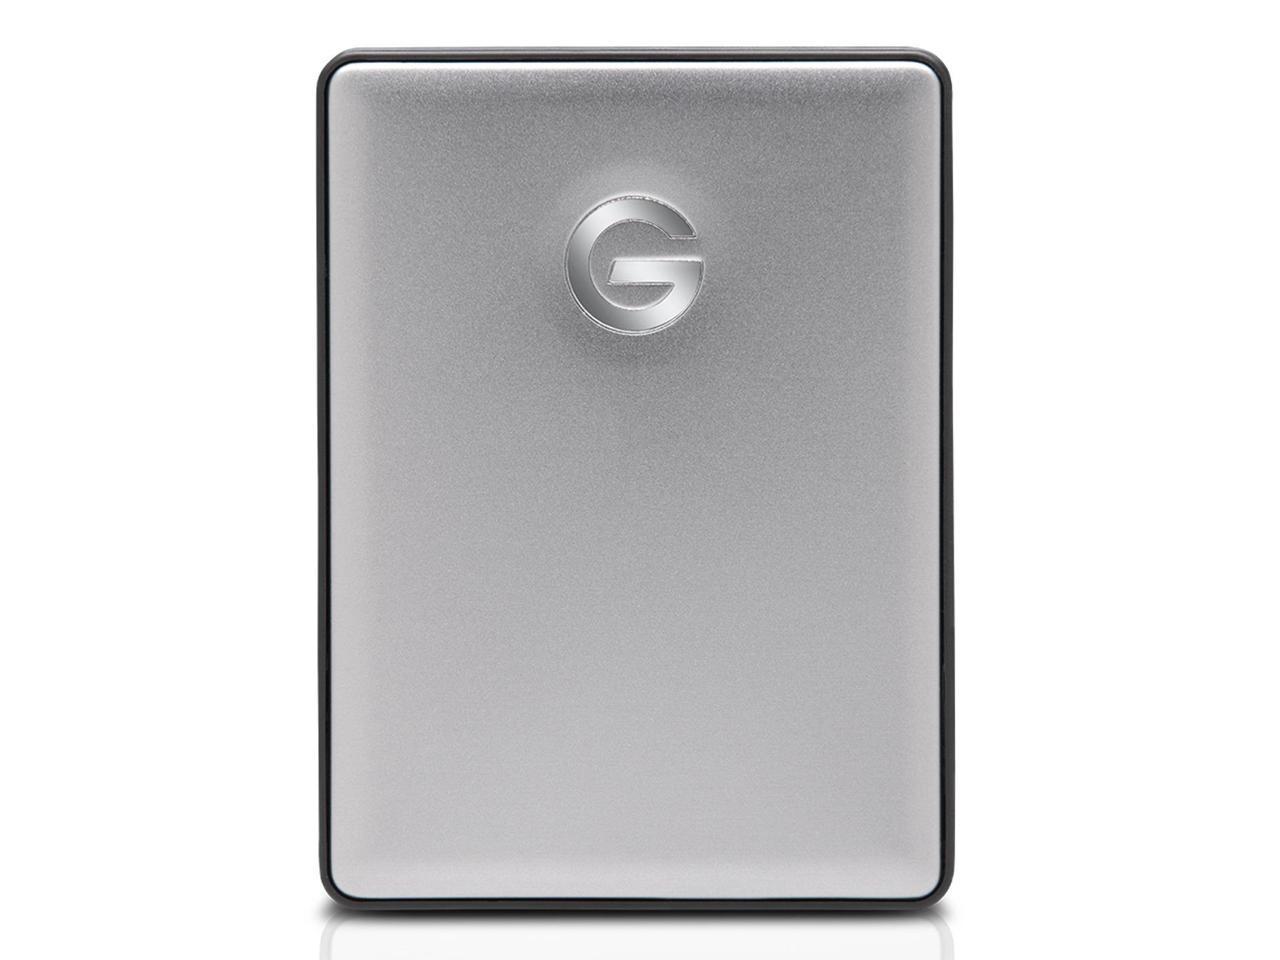 0G10317 USB 3.1 Gen 1 Space Gray G-Technology 2TB G-DRIVE Mobile USB-C Portable External Hard Drive